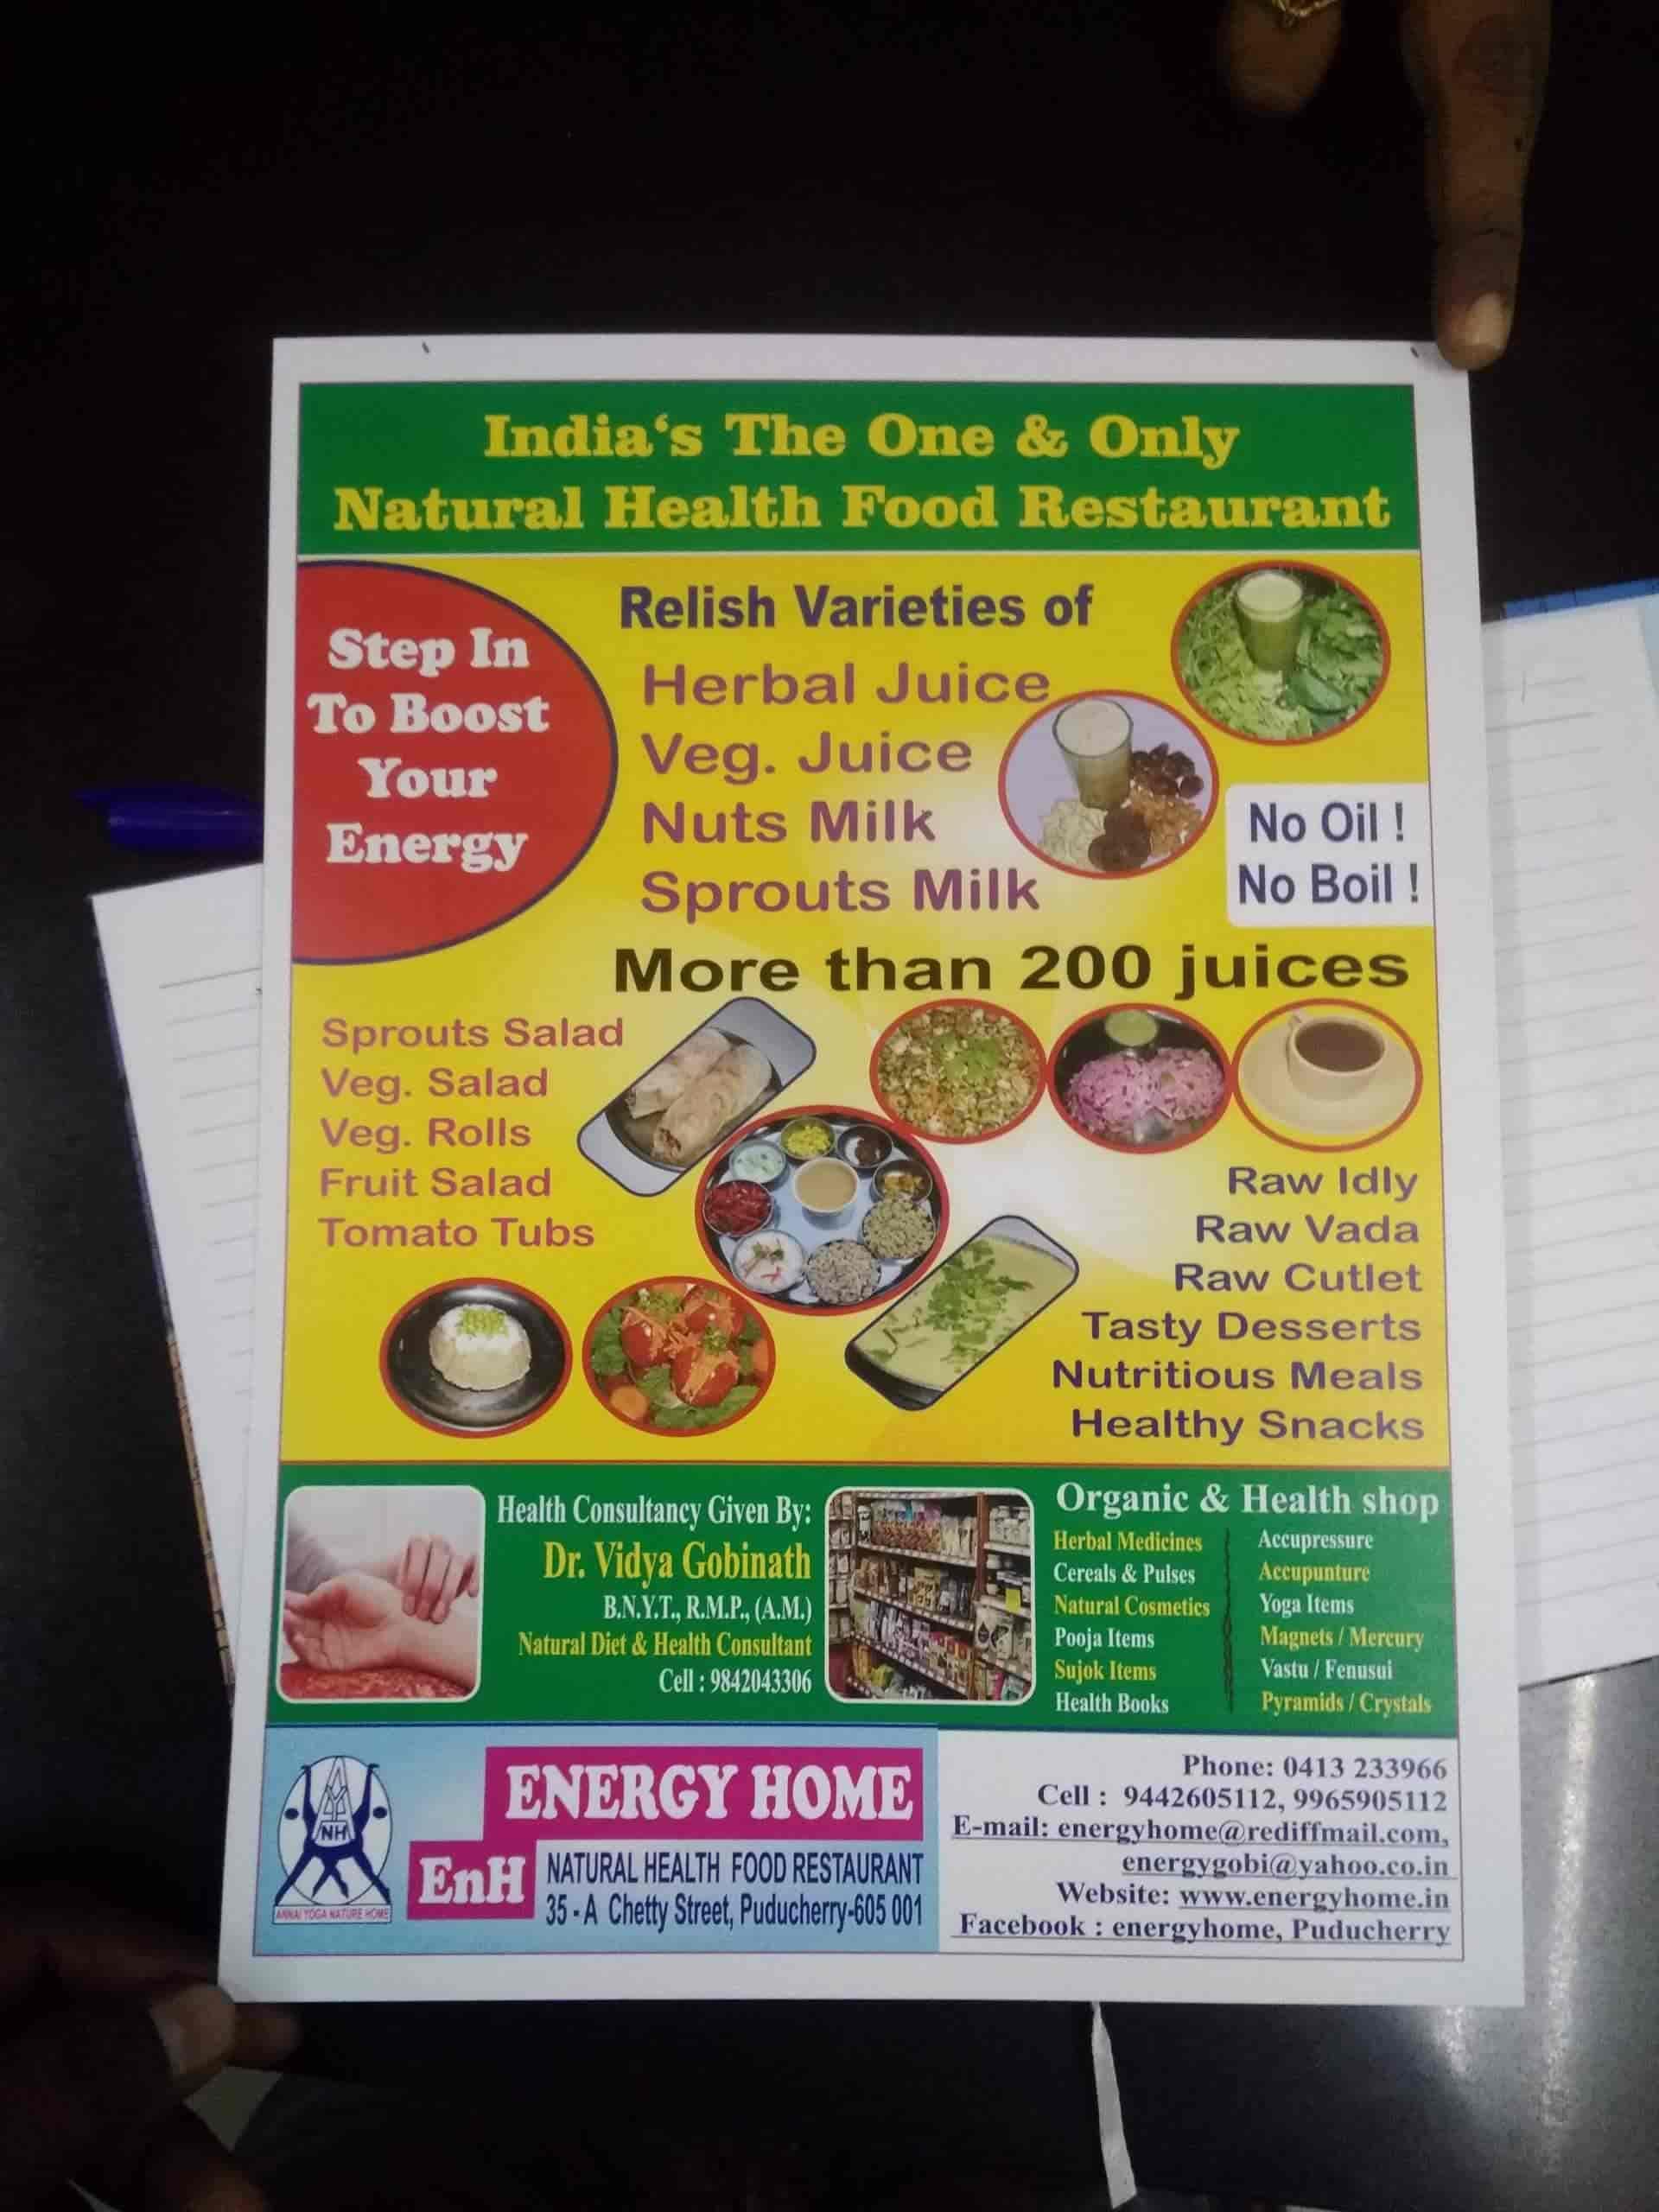 Energy Home Natural Health Food Restaurant & Health Shop